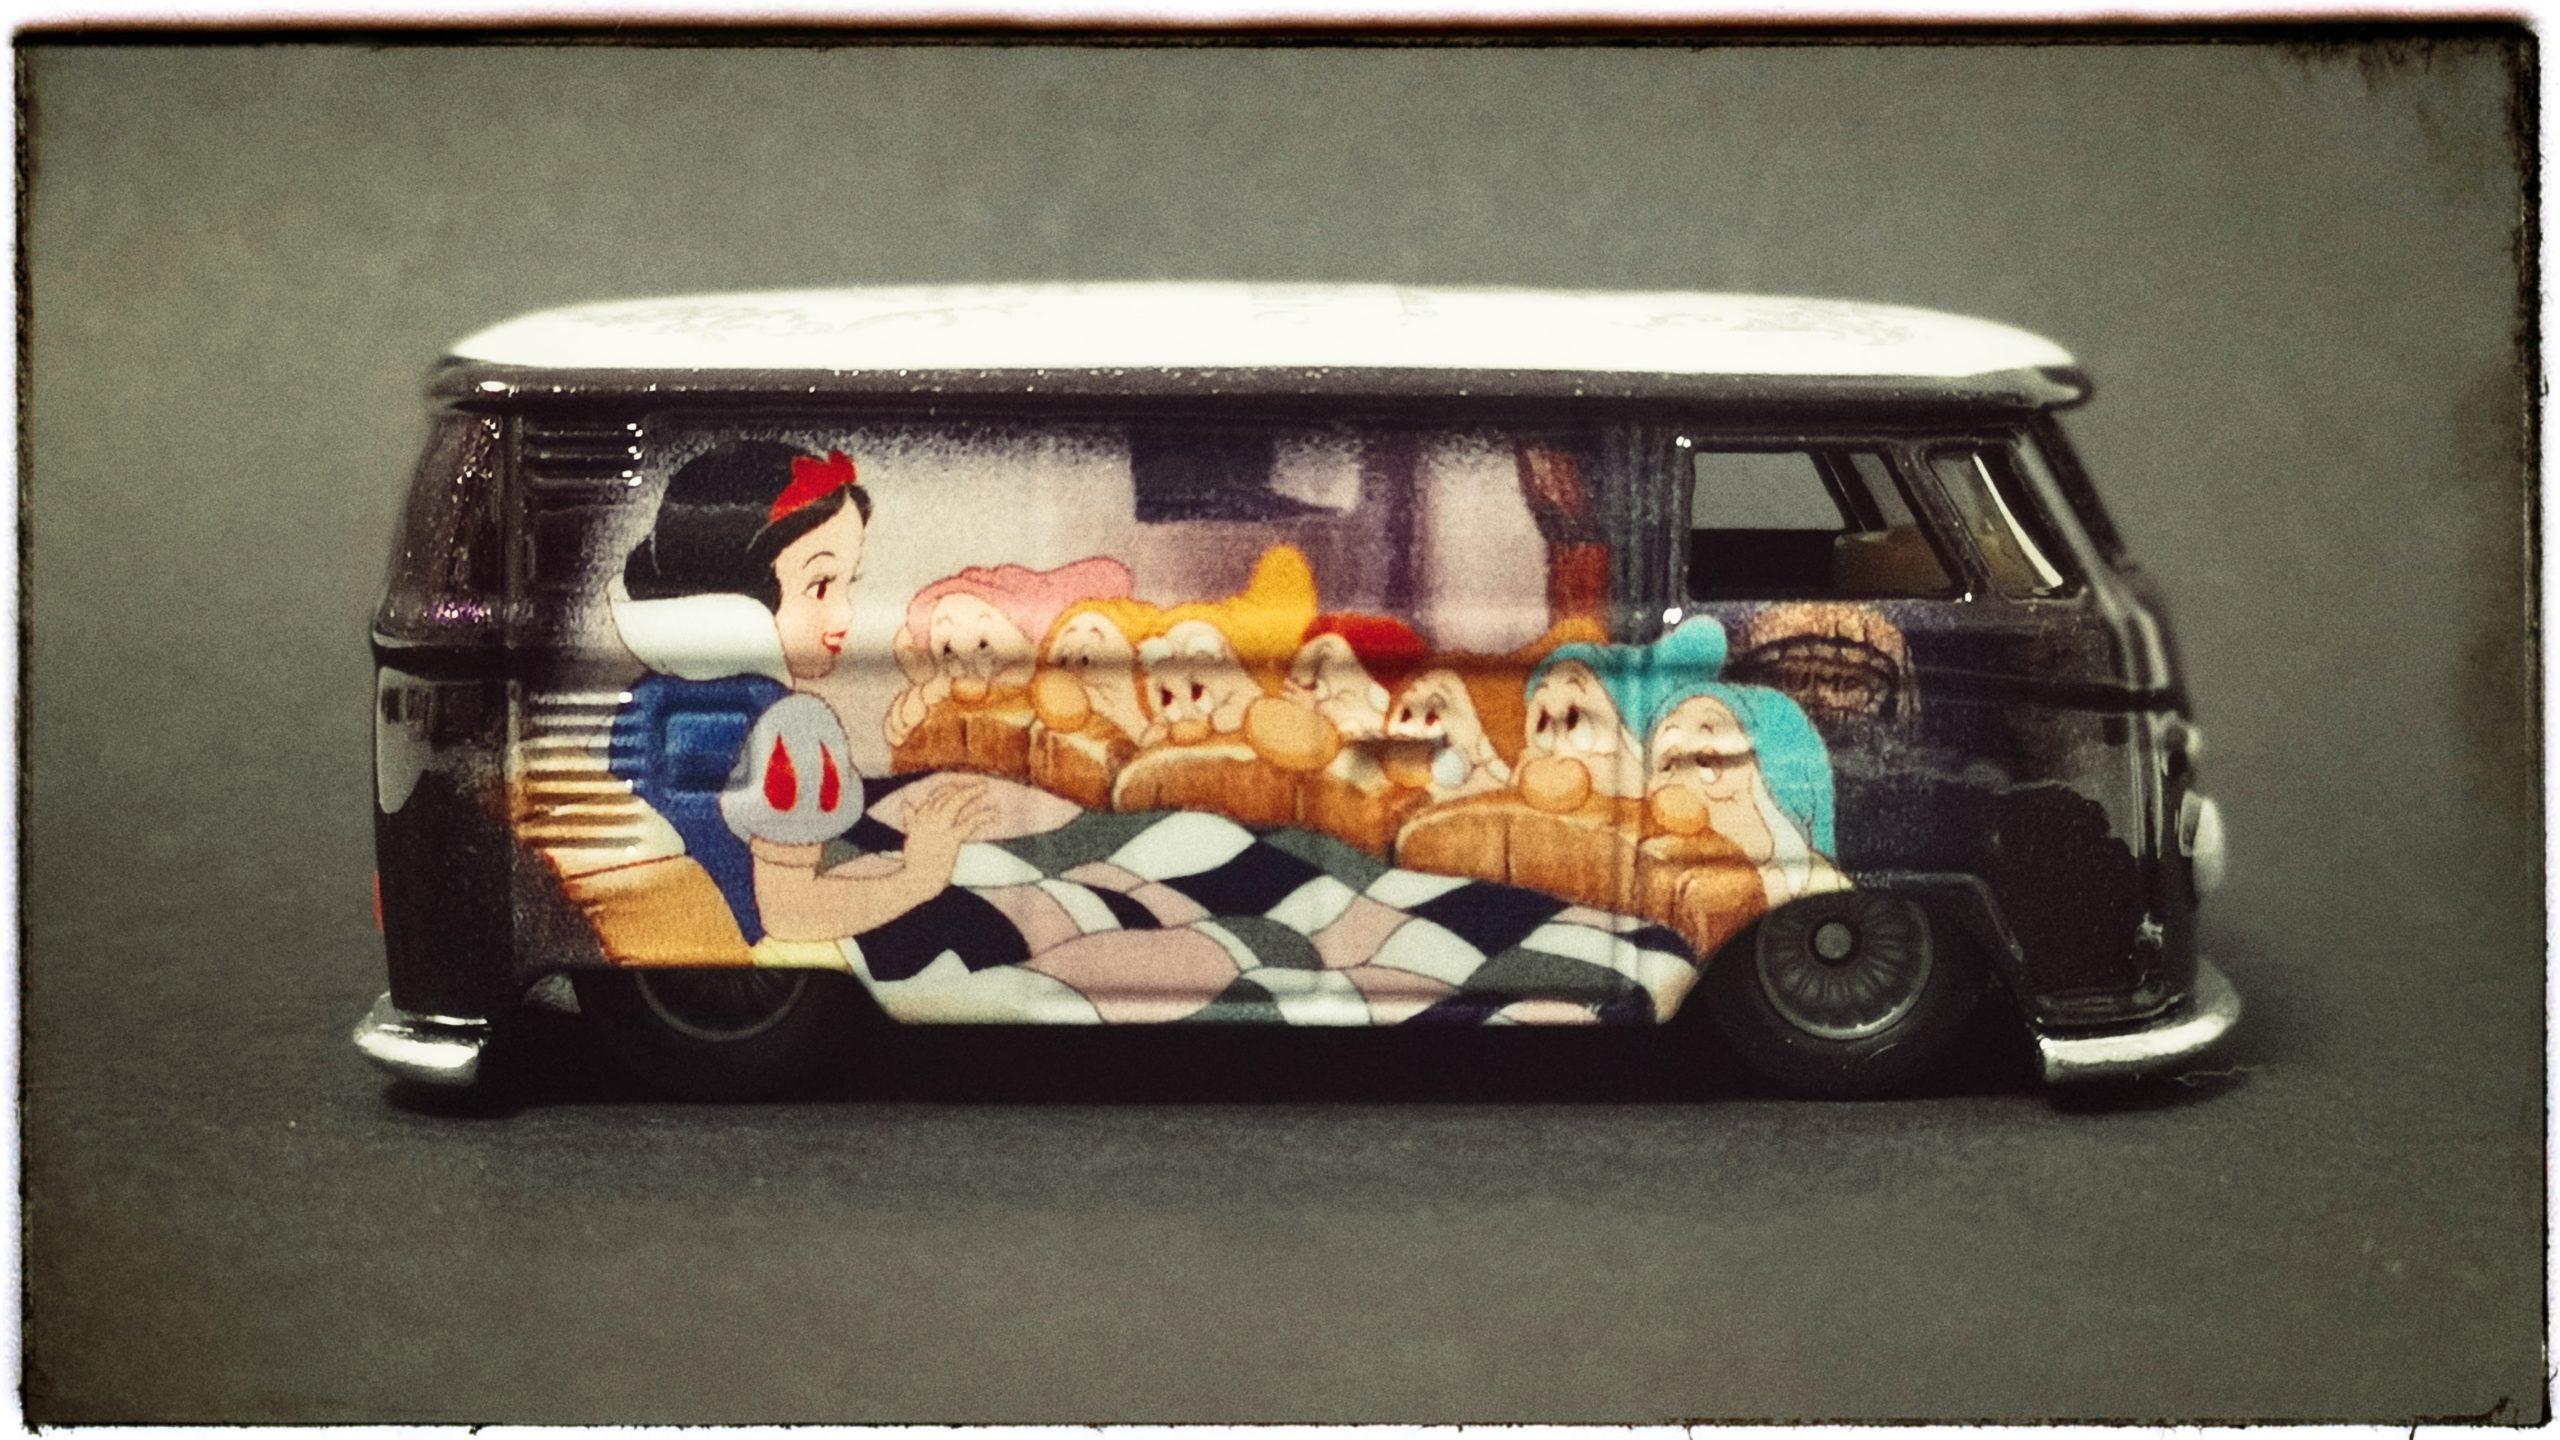 Hot Wheels Volkswagen T1 Panel Bus (FKY34) 2018 Pop Culture: Disney Snow White (1/5) metallic purple VW side